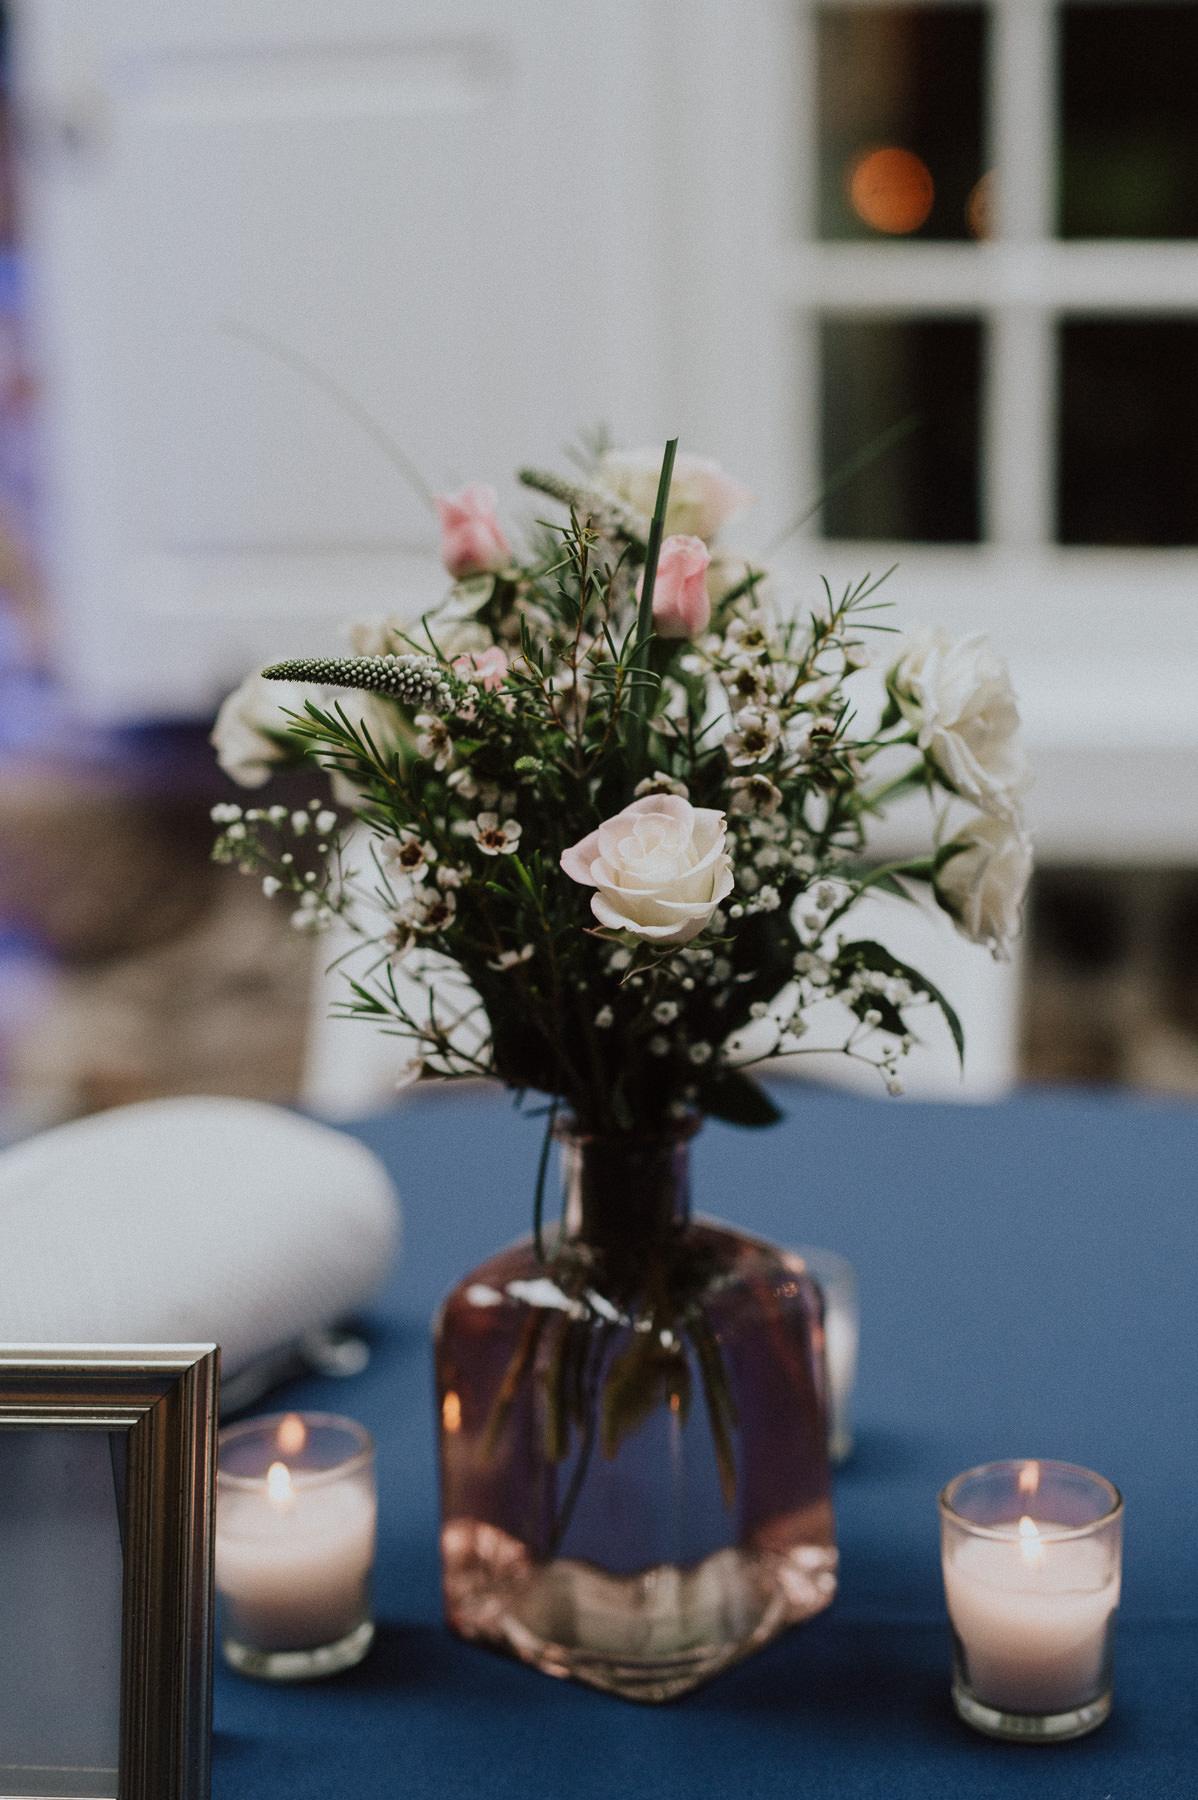 appleford-estate-wedding-photography-71.jpg